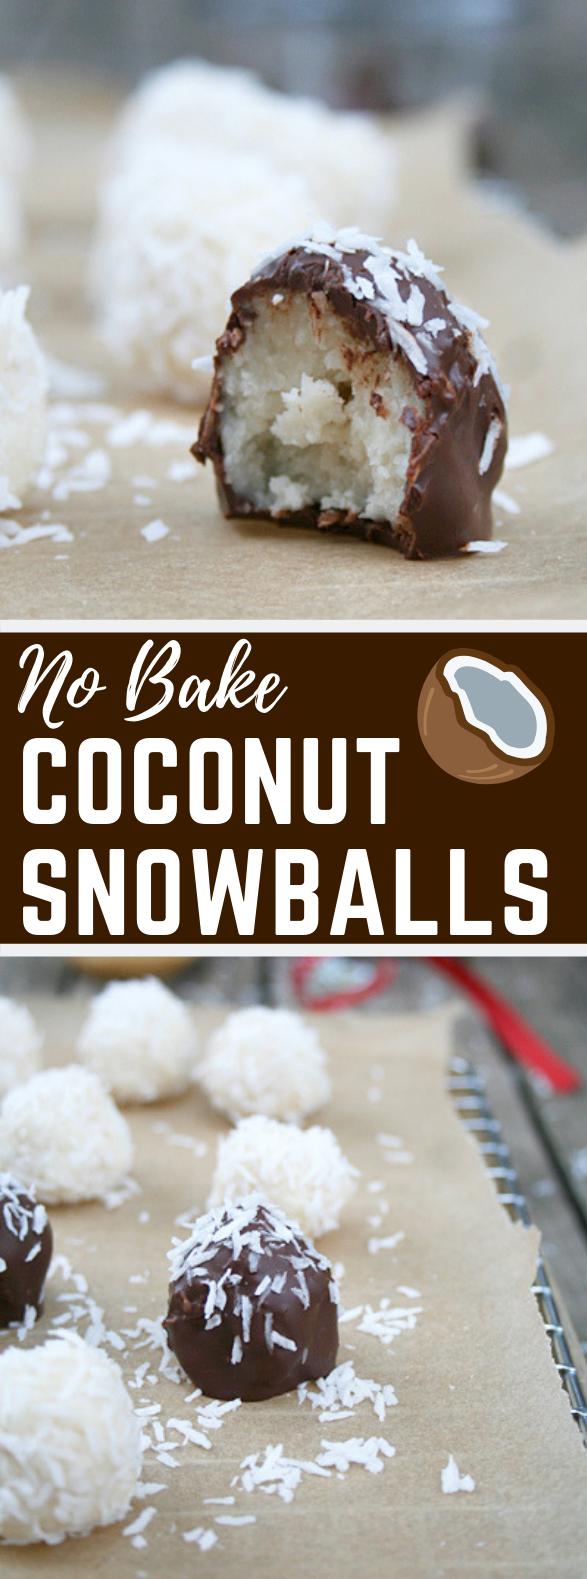 NO BAKE COCONUT SNOWBALLS (GF) #Dessert #Christmas